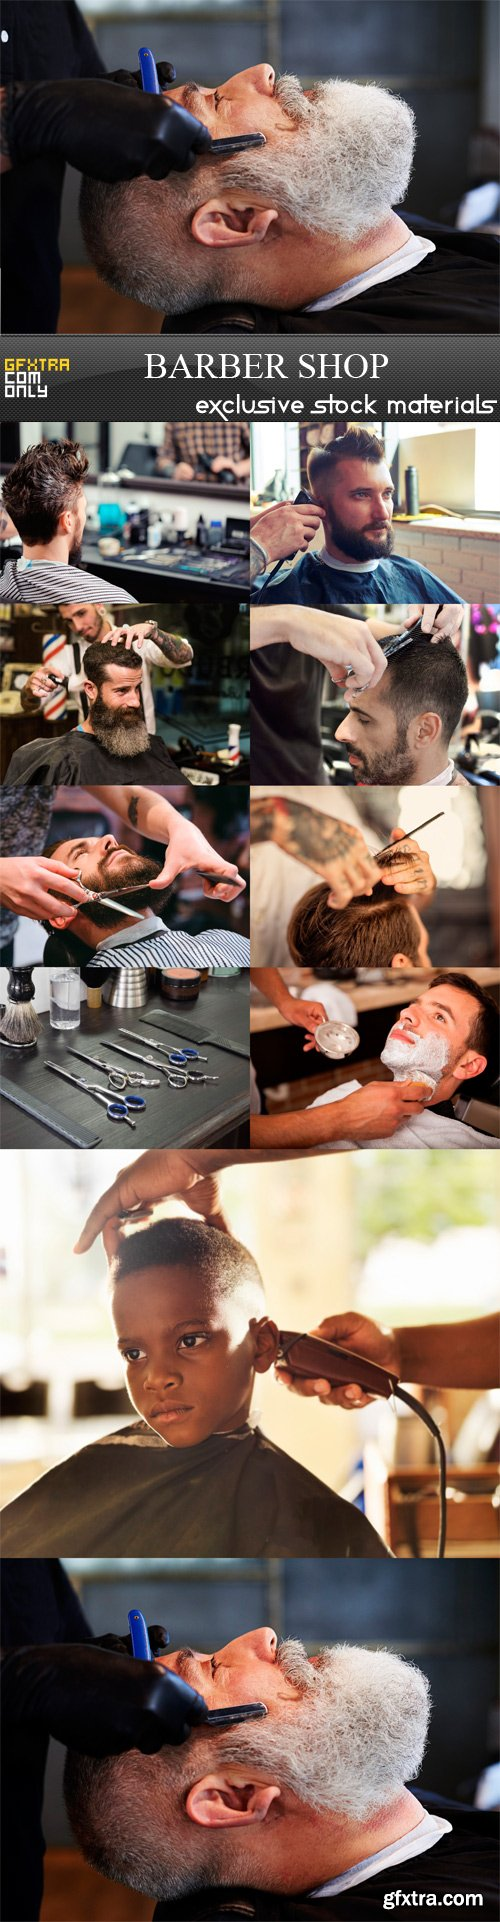 Barber Shop - 10 x JPEGs